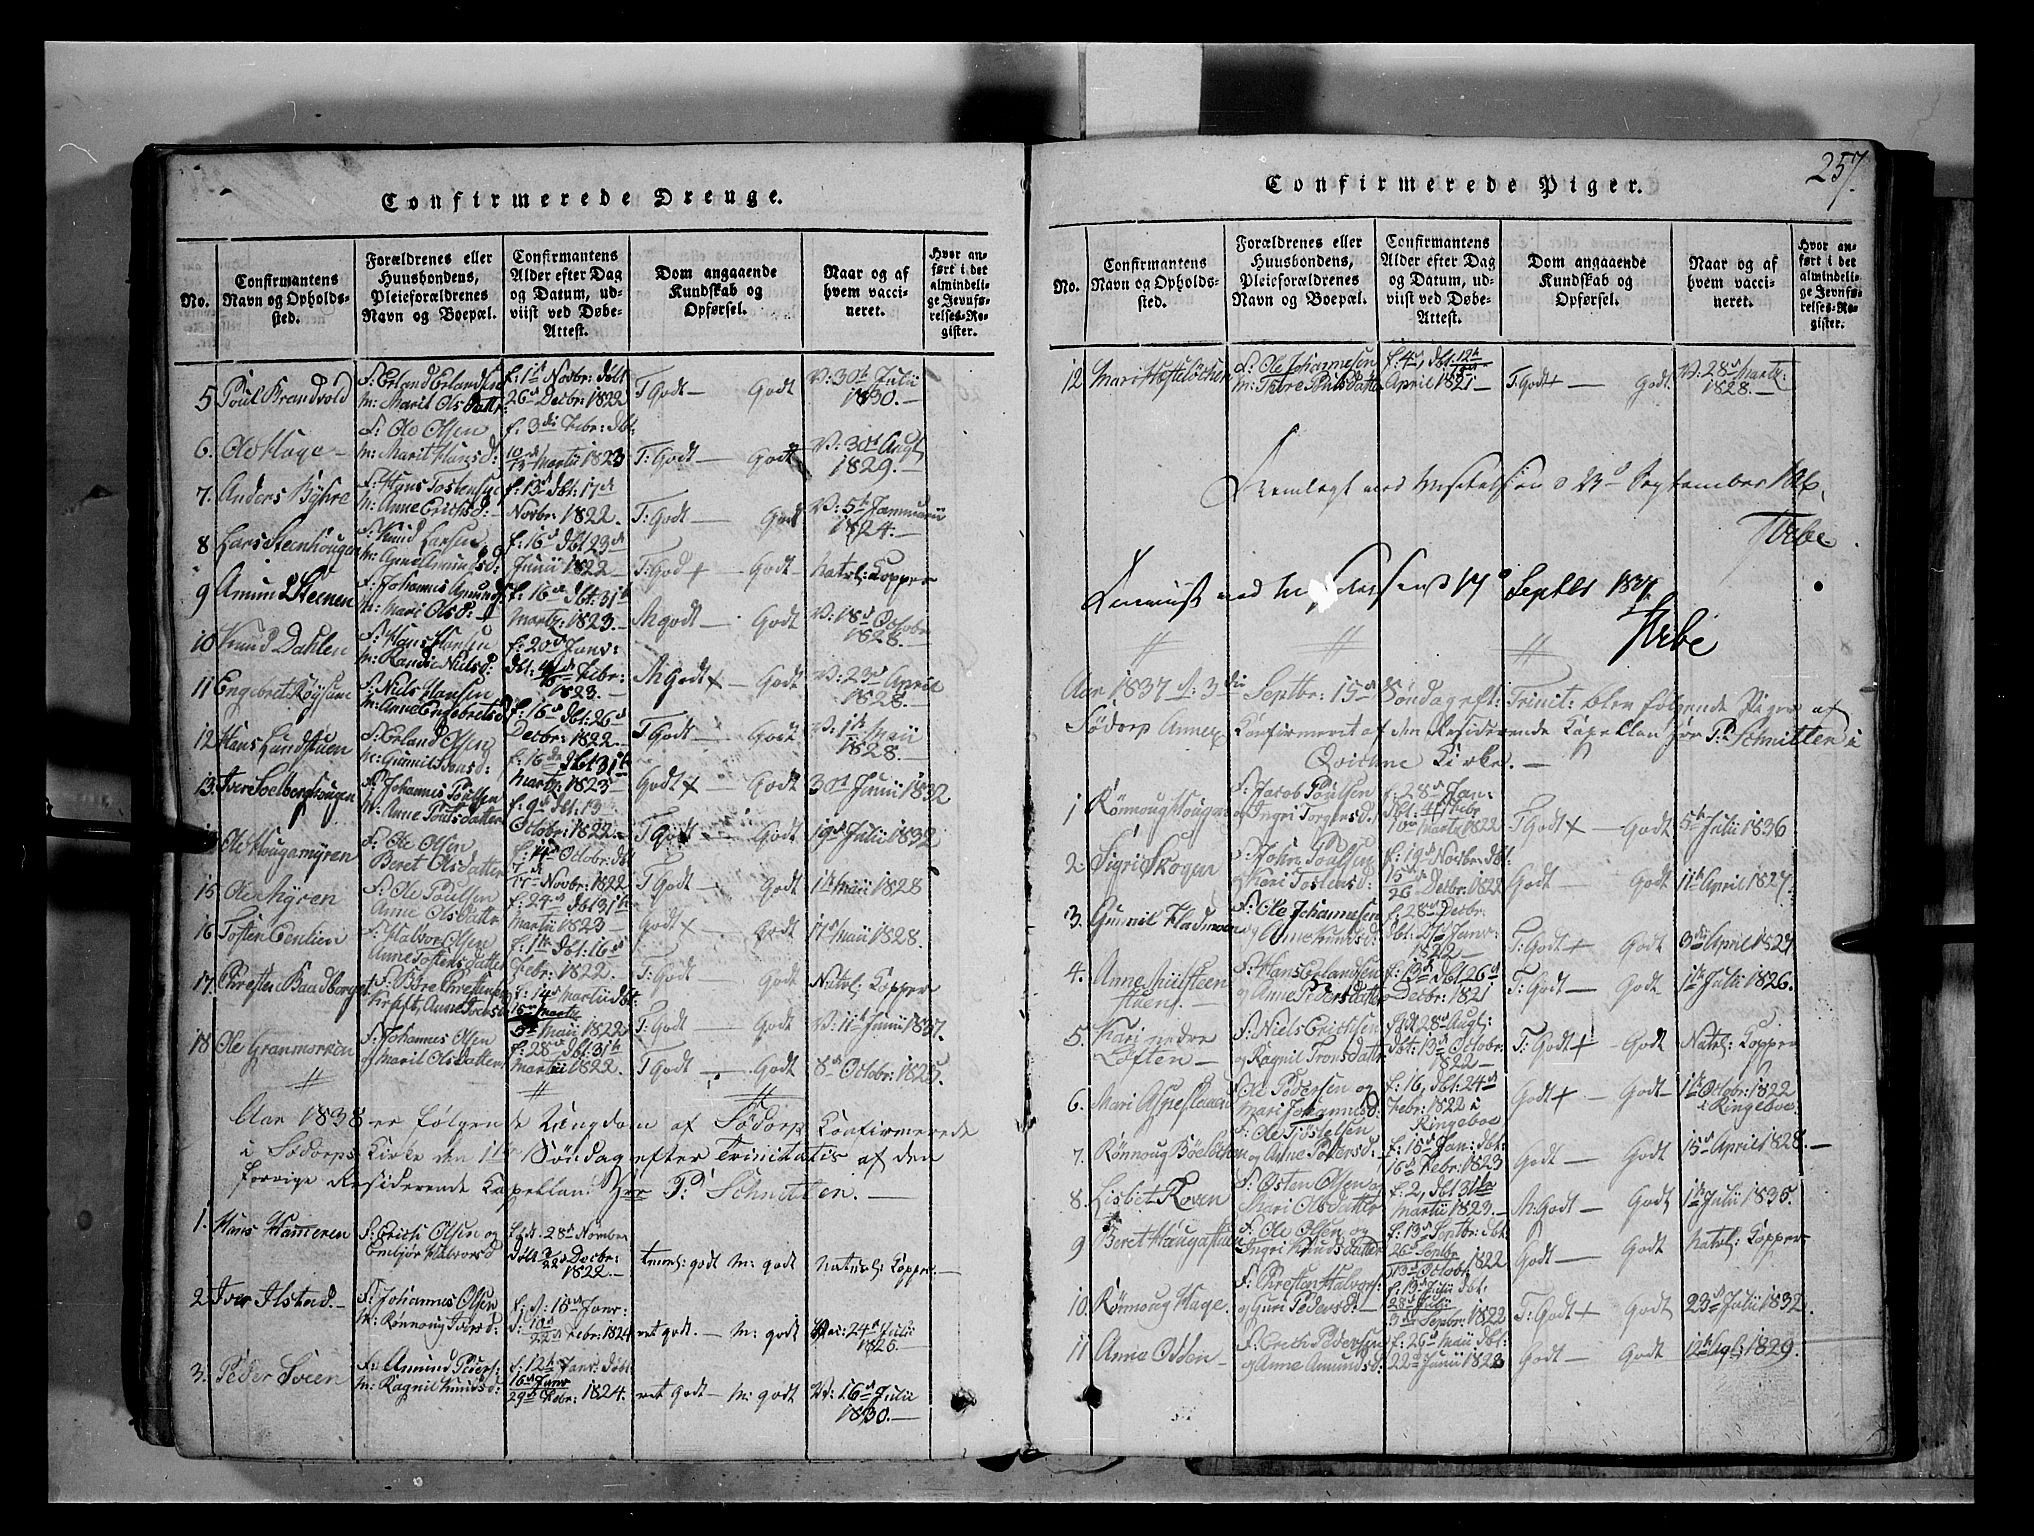 SAH, Fron prestekontor, H/Ha/Hab/L0004: Klokkerbok nr. 4, 1816-1850, s. 257